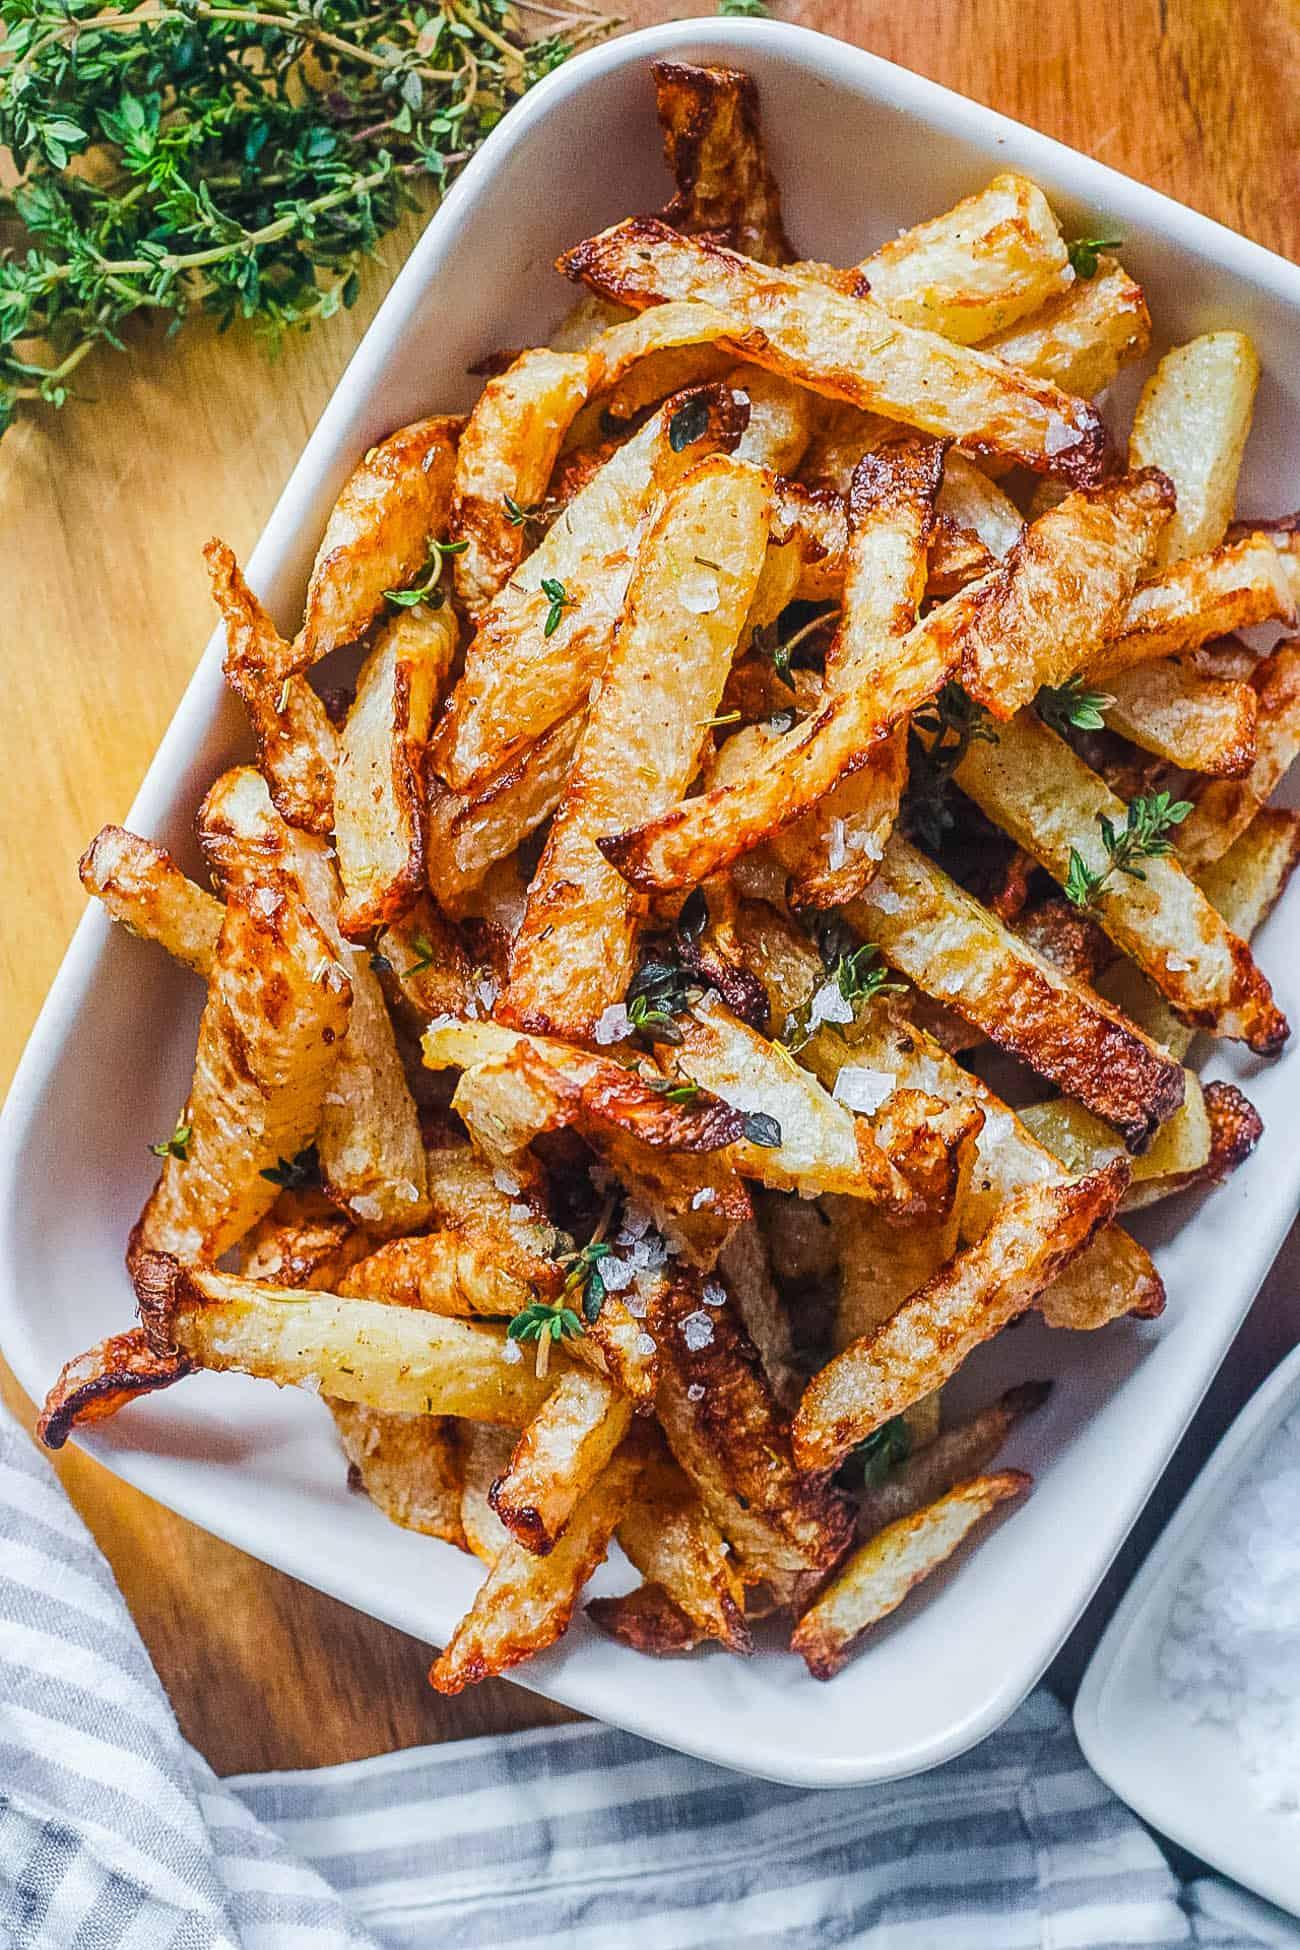 vegan easy air fryer jicama fries in a white serving dish